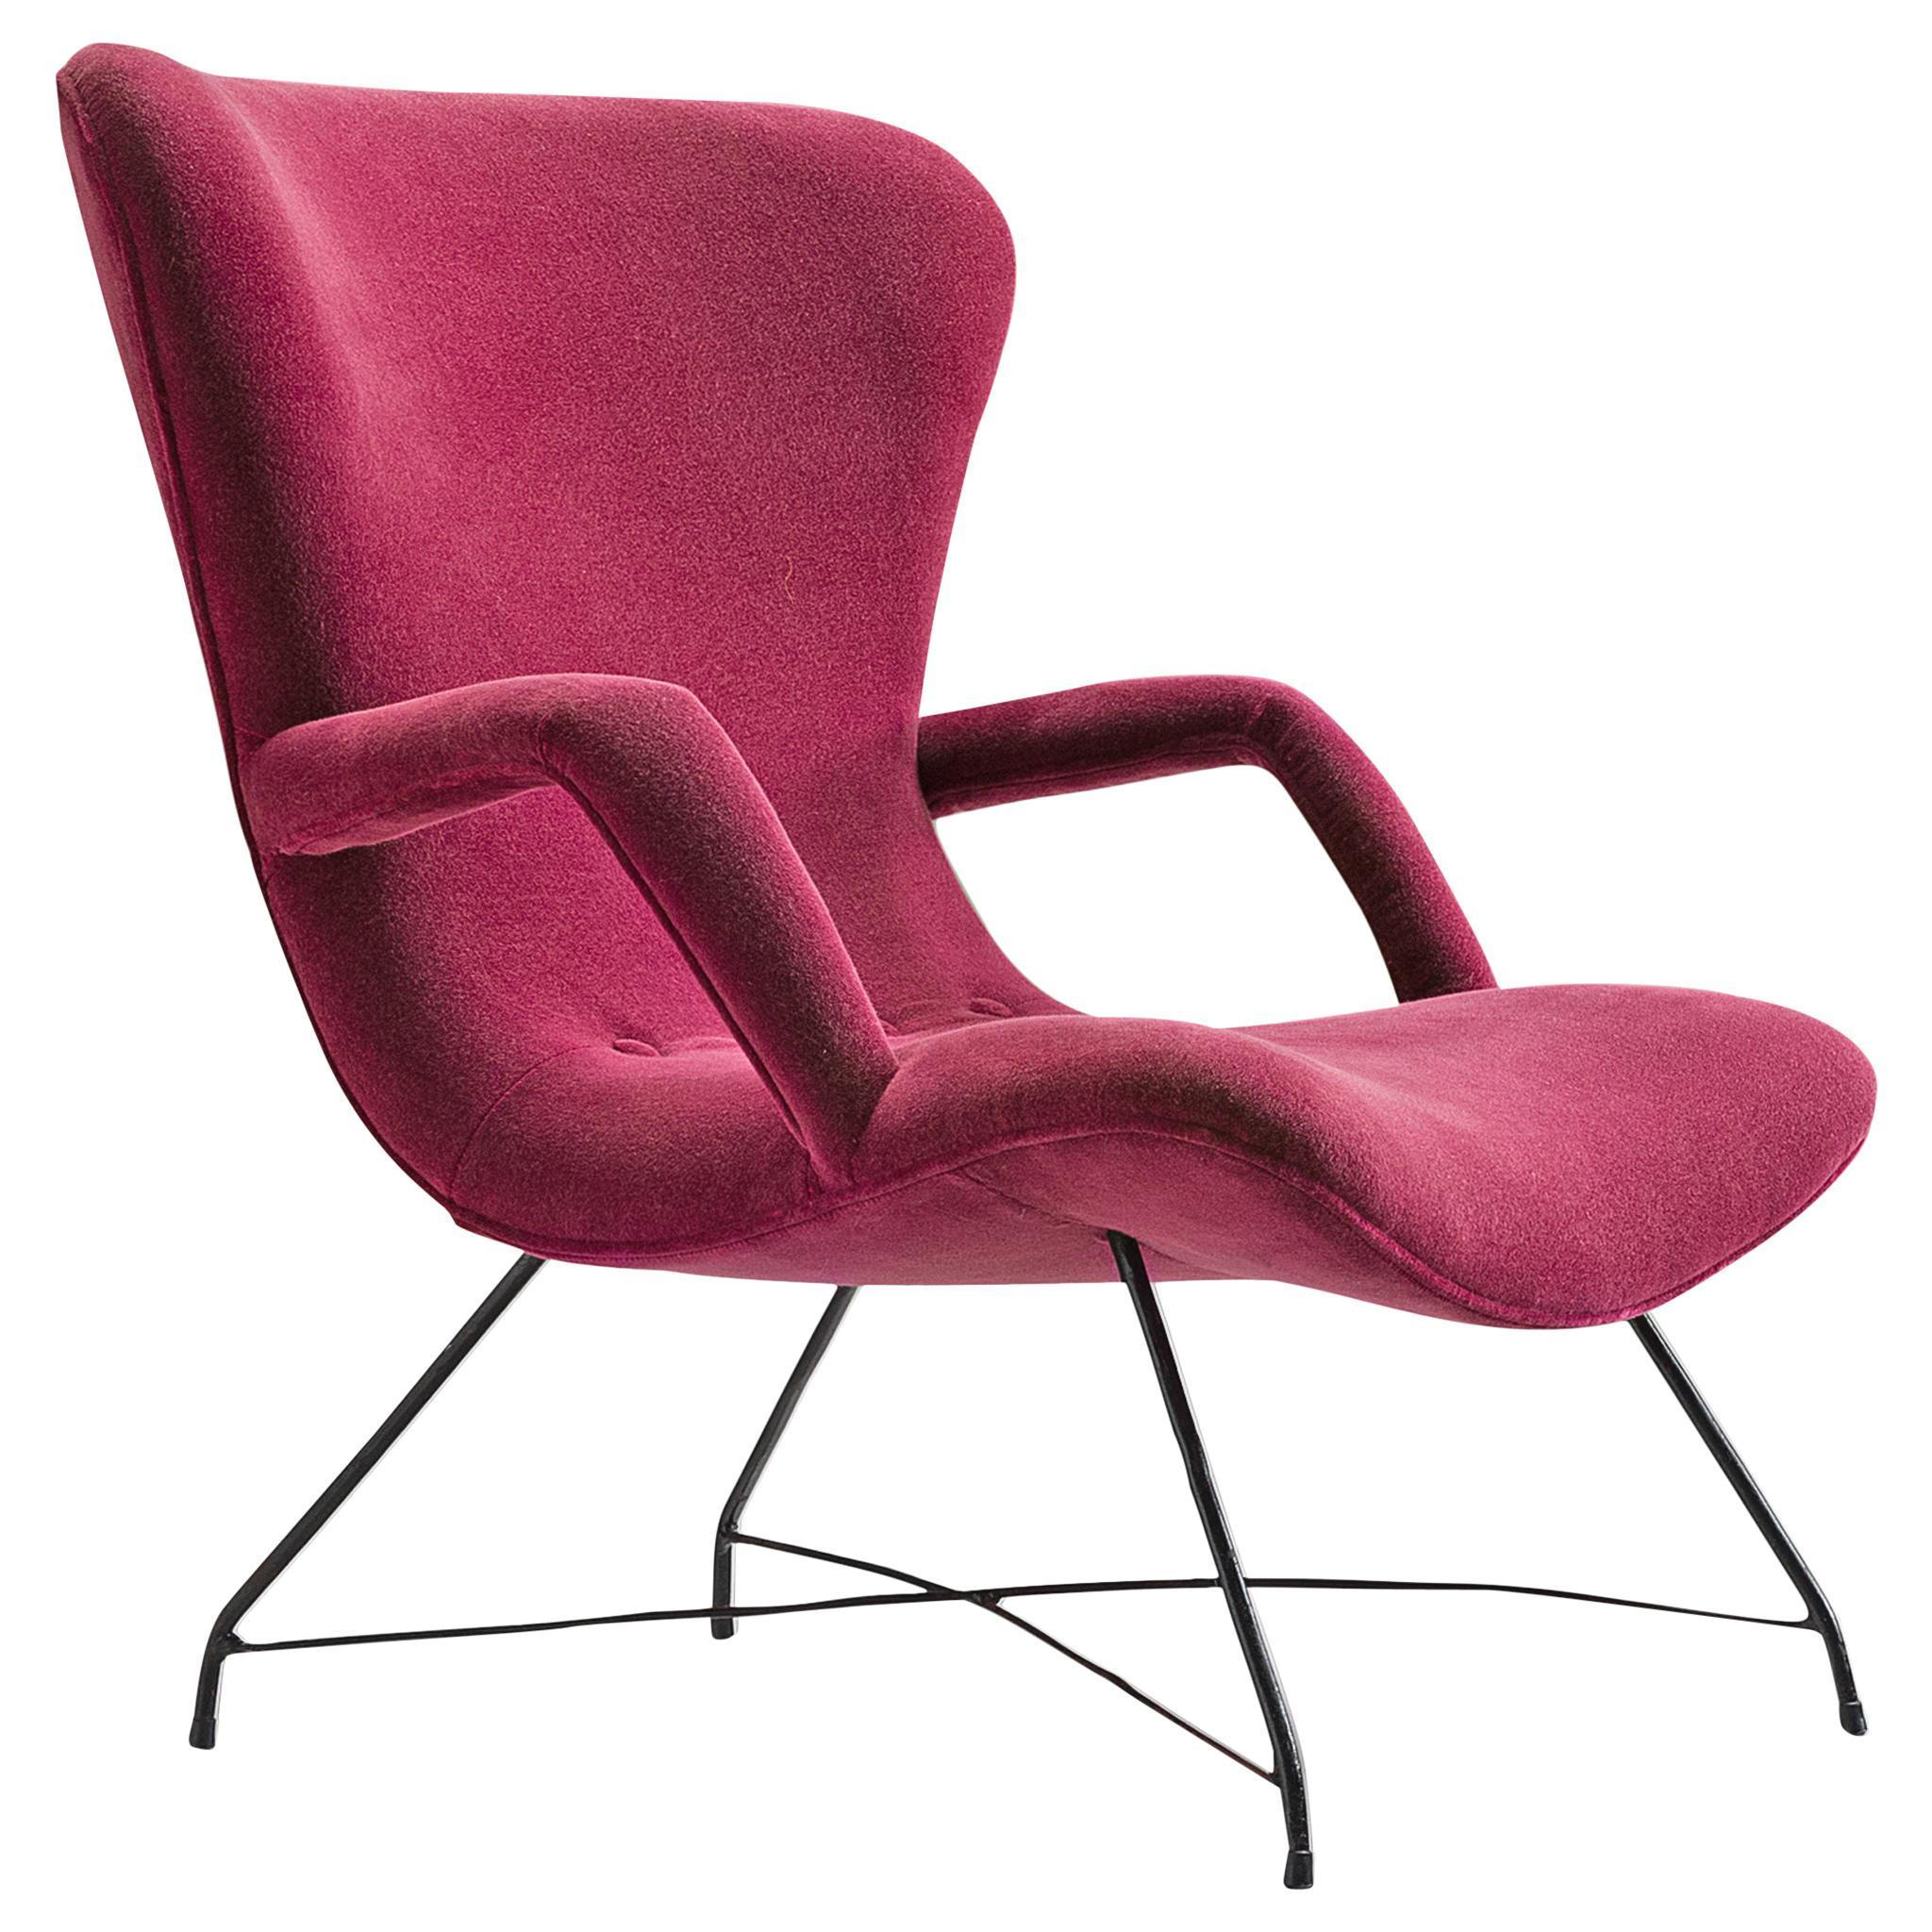 Eisler & Hauner Customizable Lounge Chair for Forma